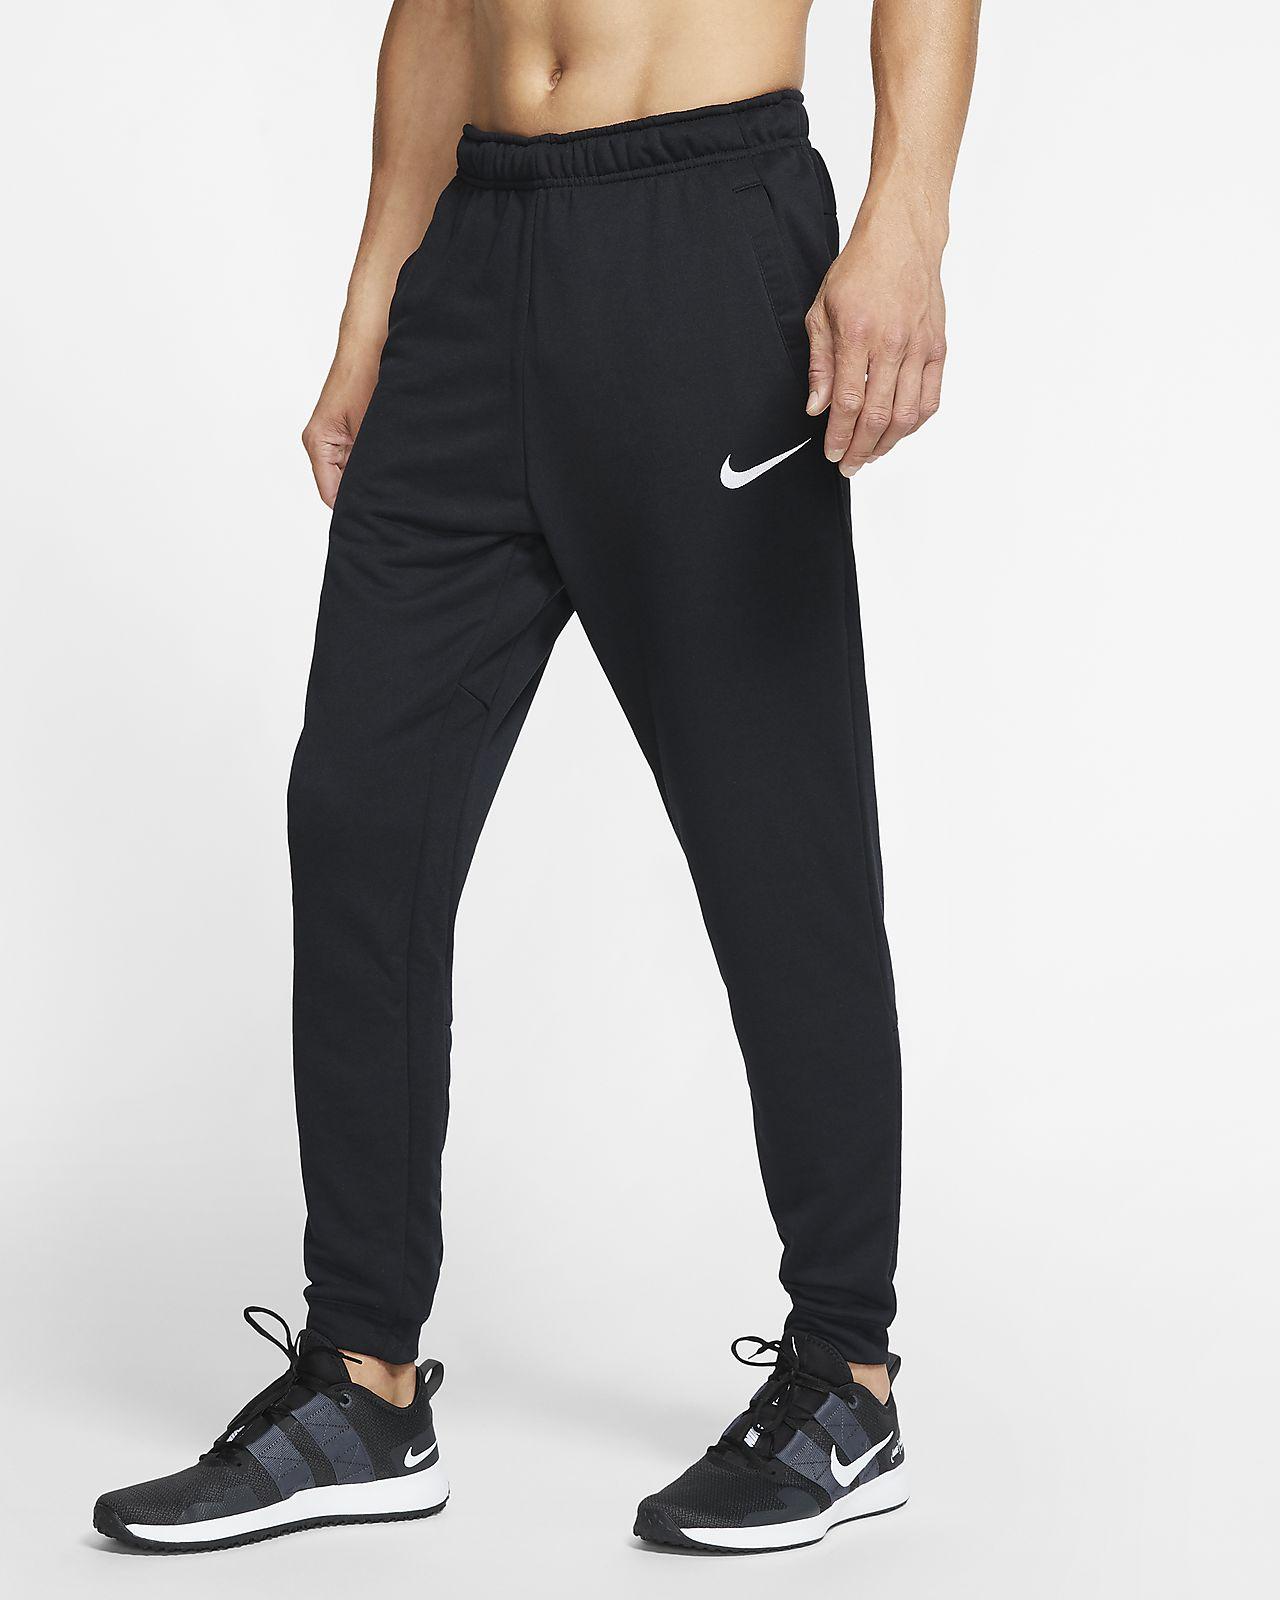 fashion best website clearance sale Nike Dri-FIT schmal zulaufende Fleece-Trainingshose für Herren